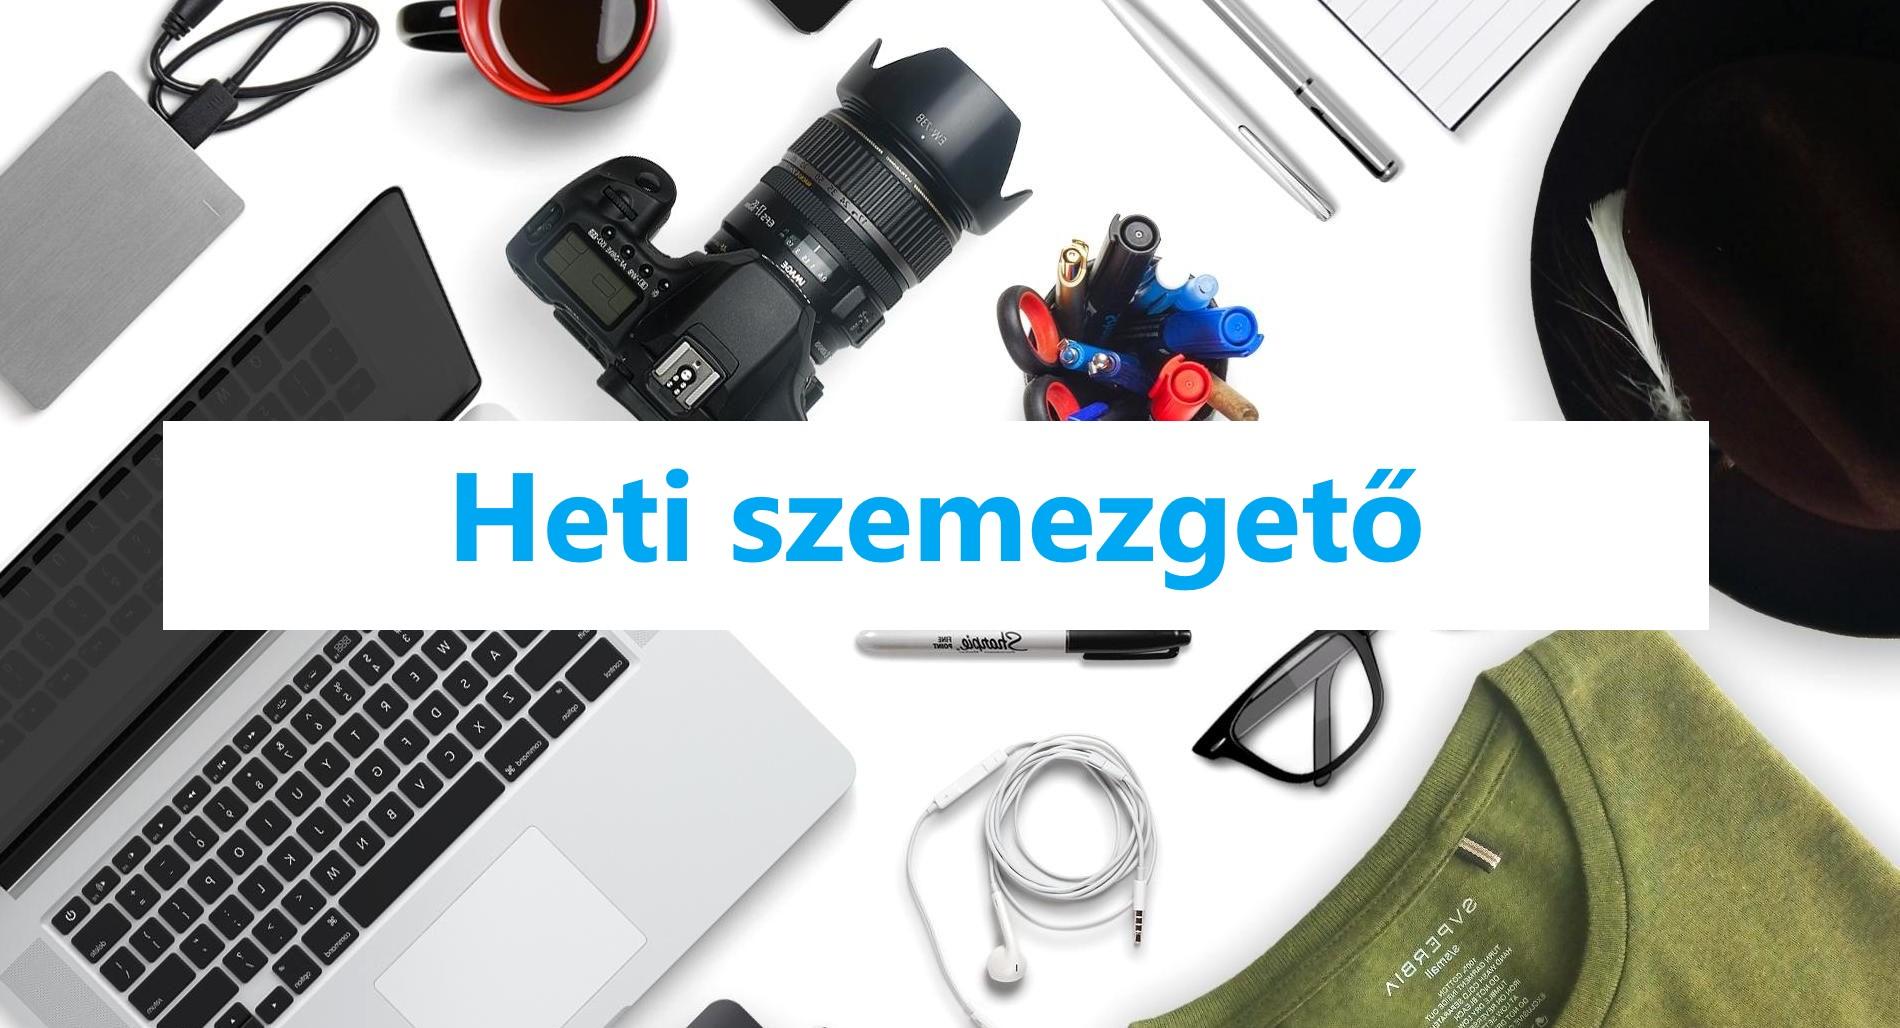 heti_szemezgeto_uj_80.jpg